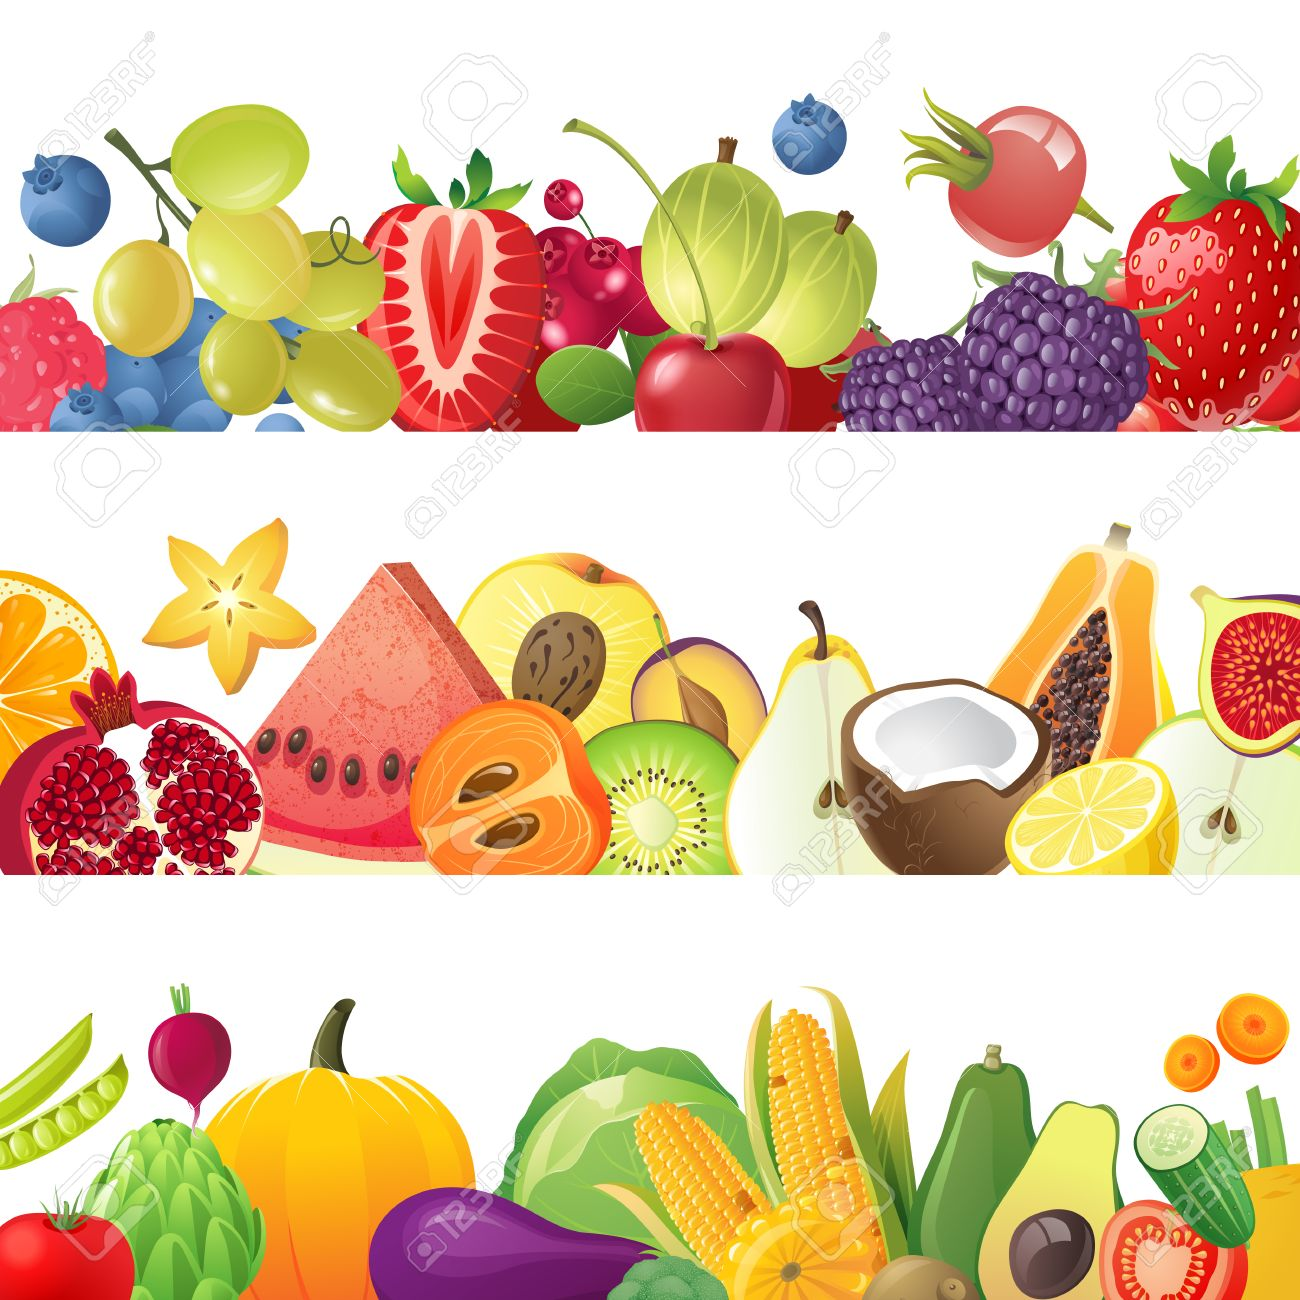 3 Fruits Vegetables And Berries Horizontal Borders Royalty Free